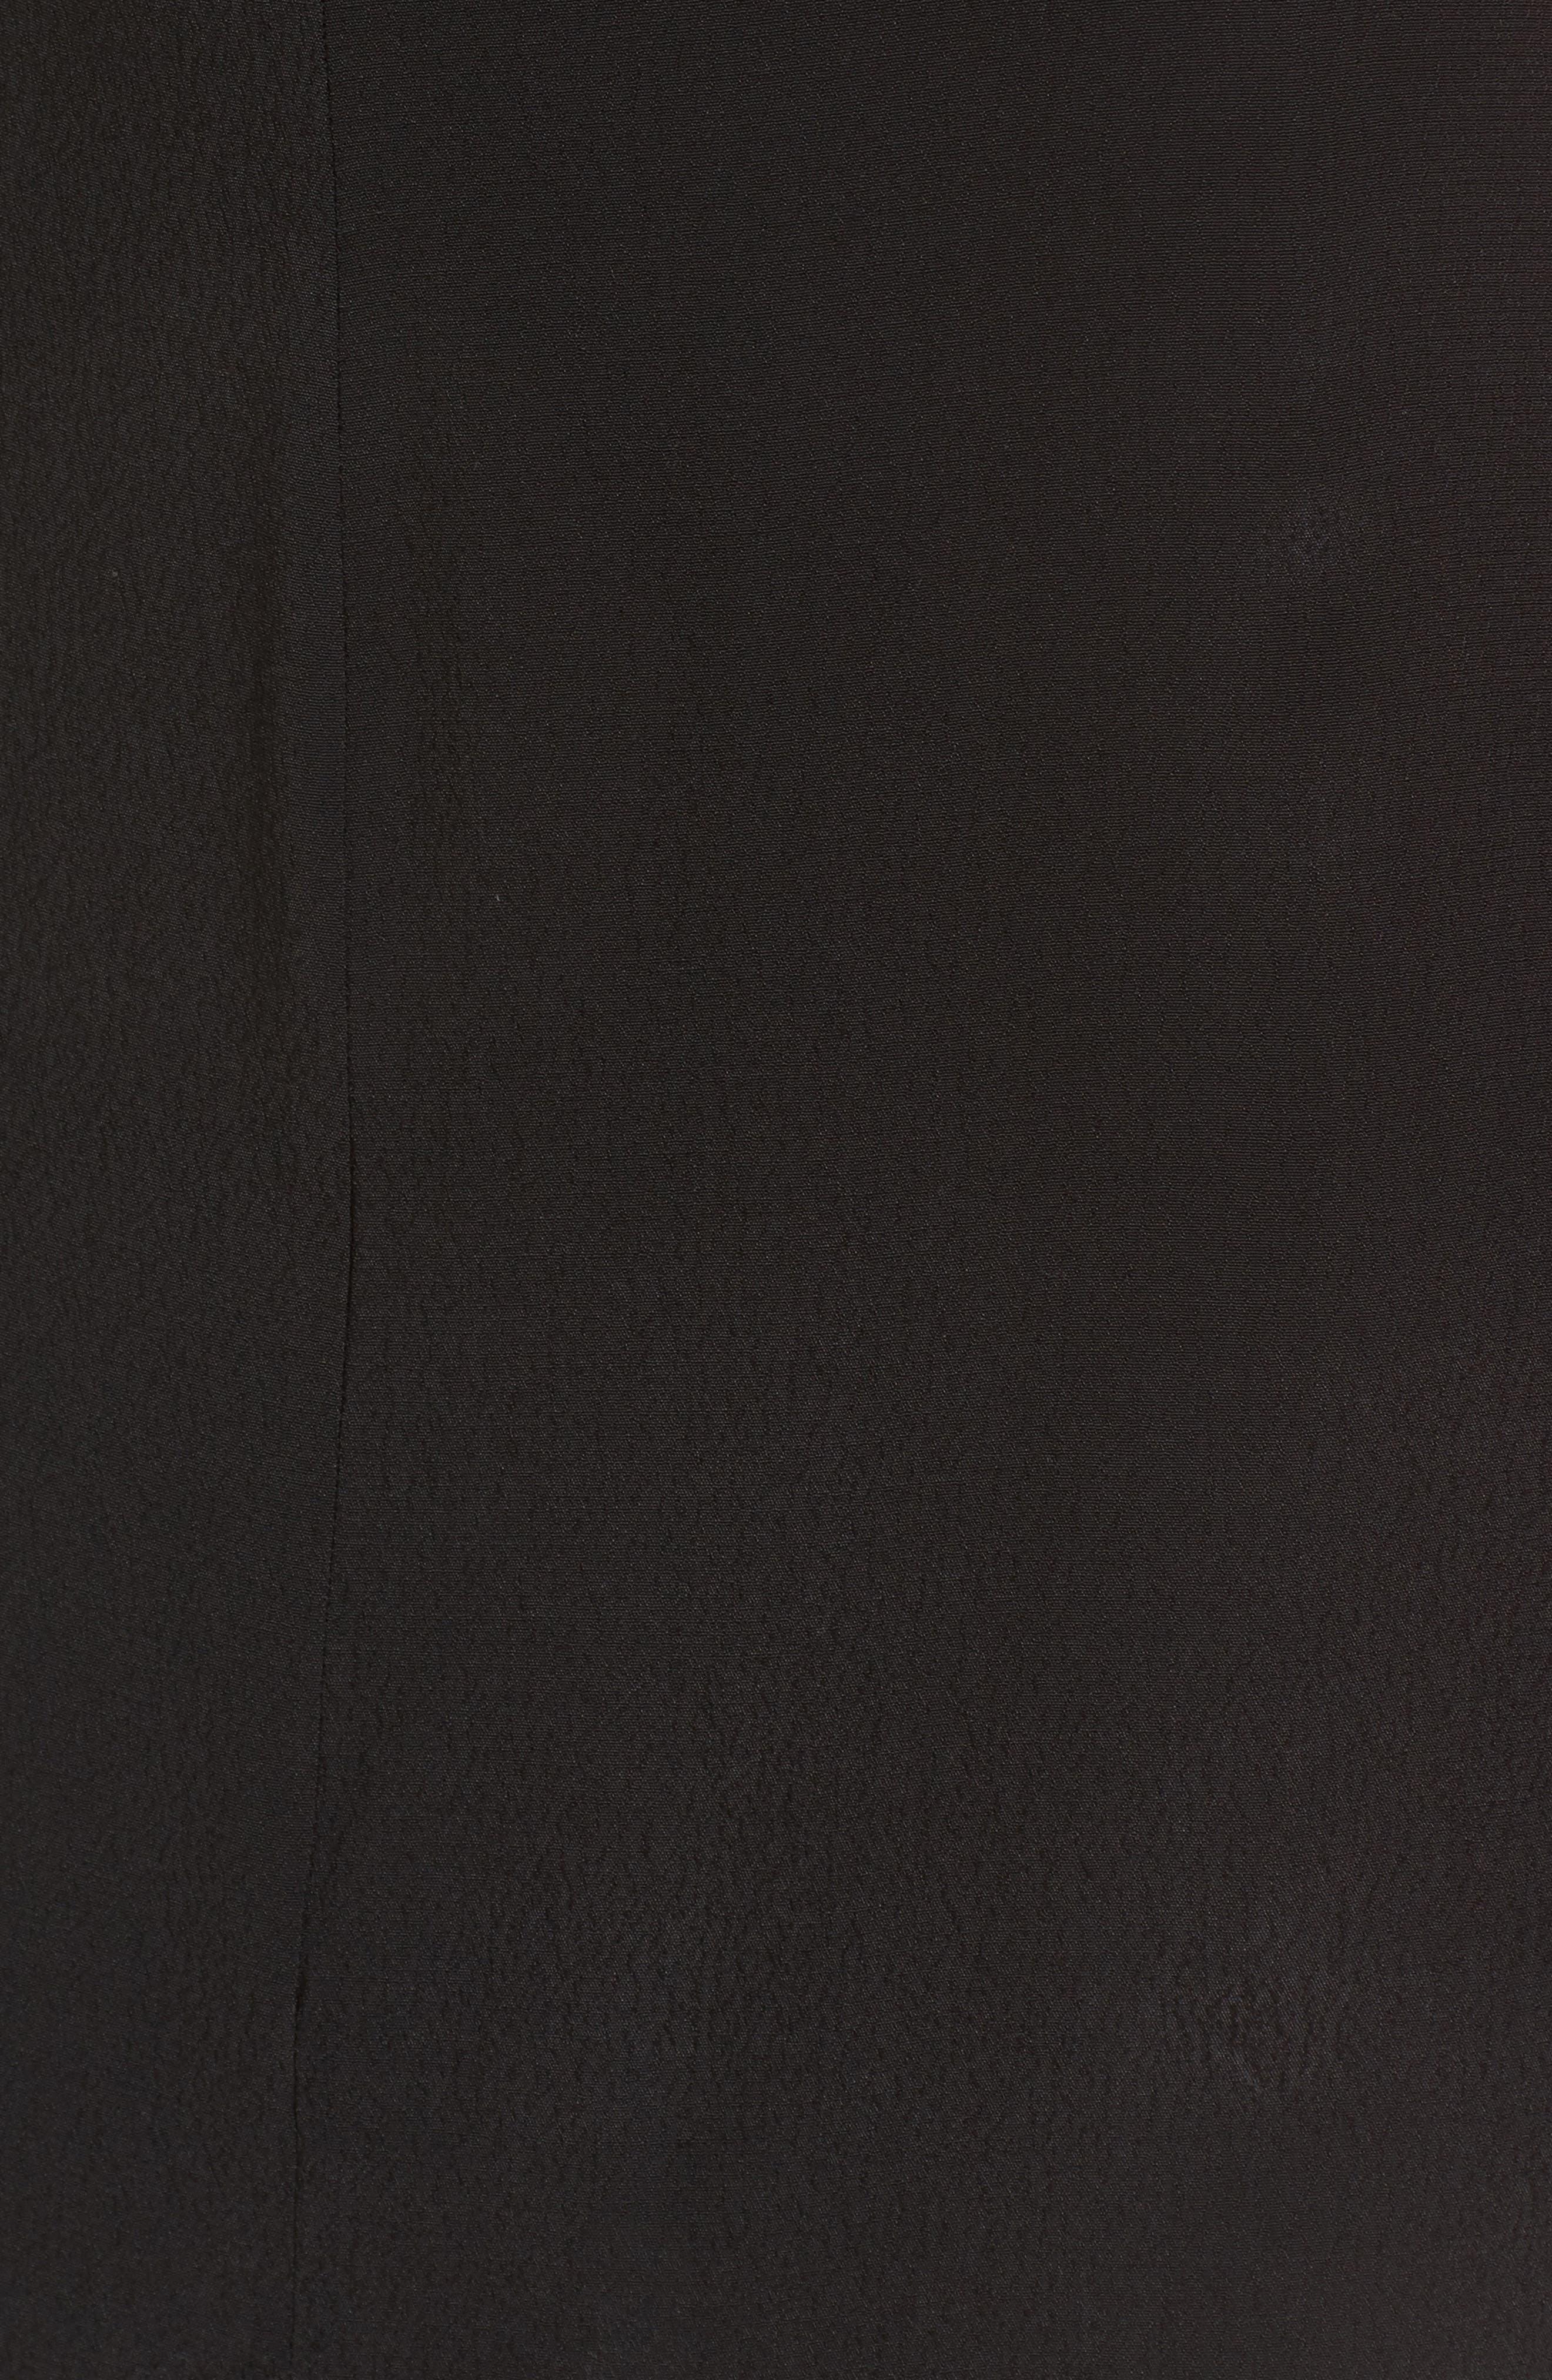 Backless Sheath Dress,                             Alternate thumbnail 5, color,                             001